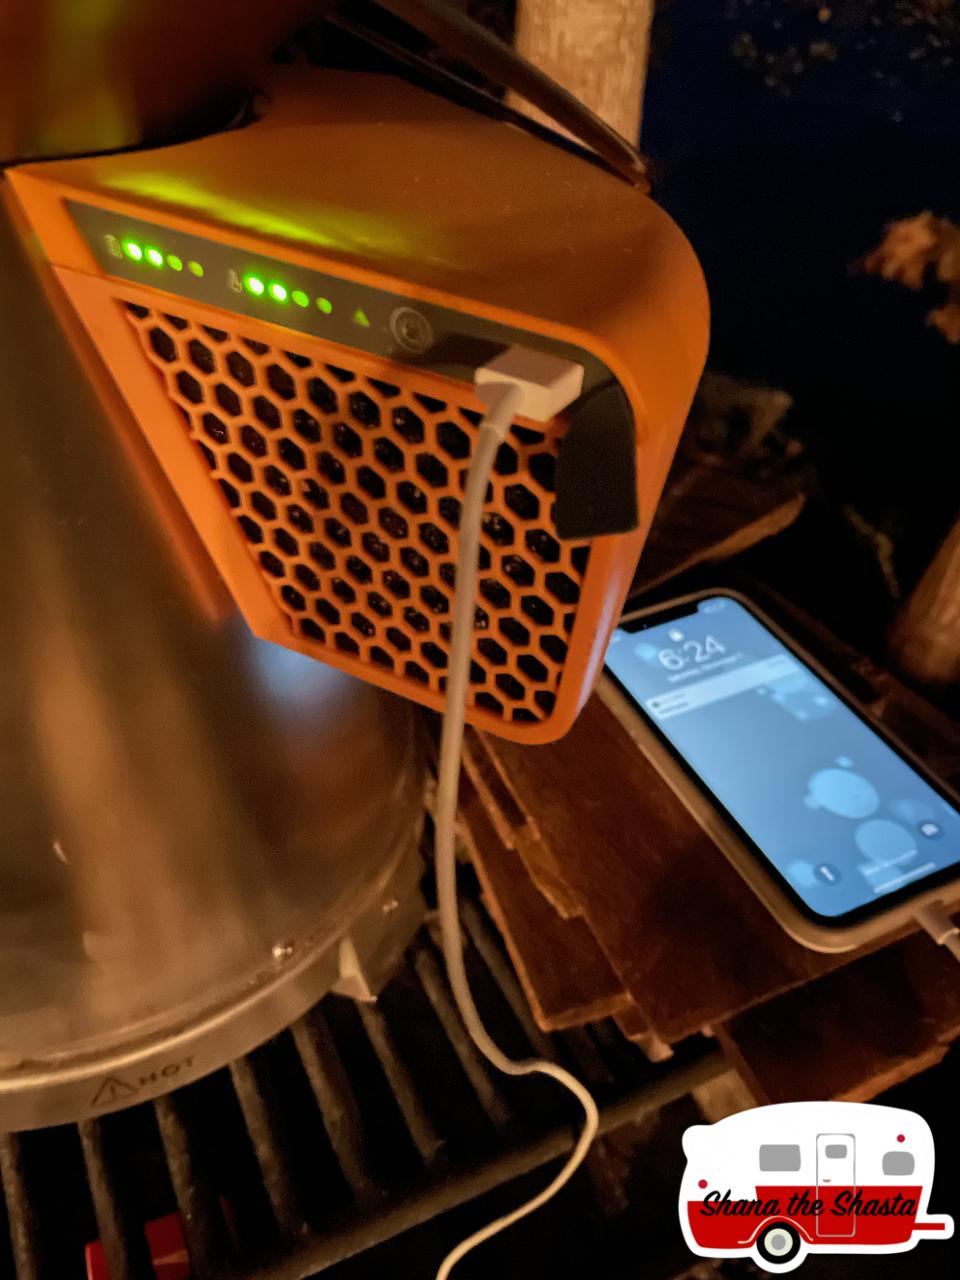 Biolite-Charging-iPhone